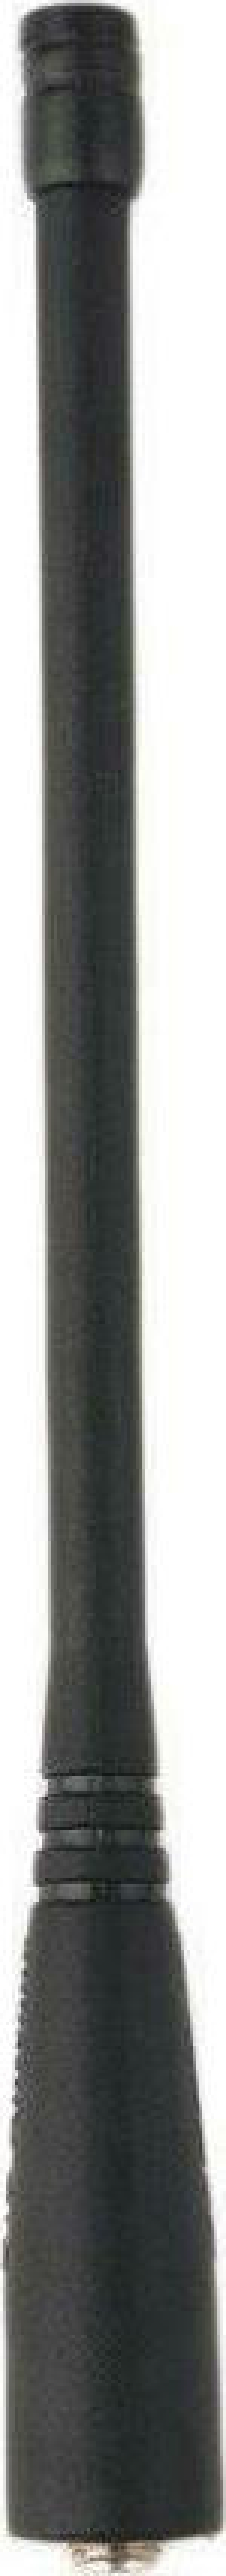 Original Baofeng Dual-Band High Gain Antenna Original VHF/UHF for UV-5R BF-888S - Κεραία πομποδέκτη